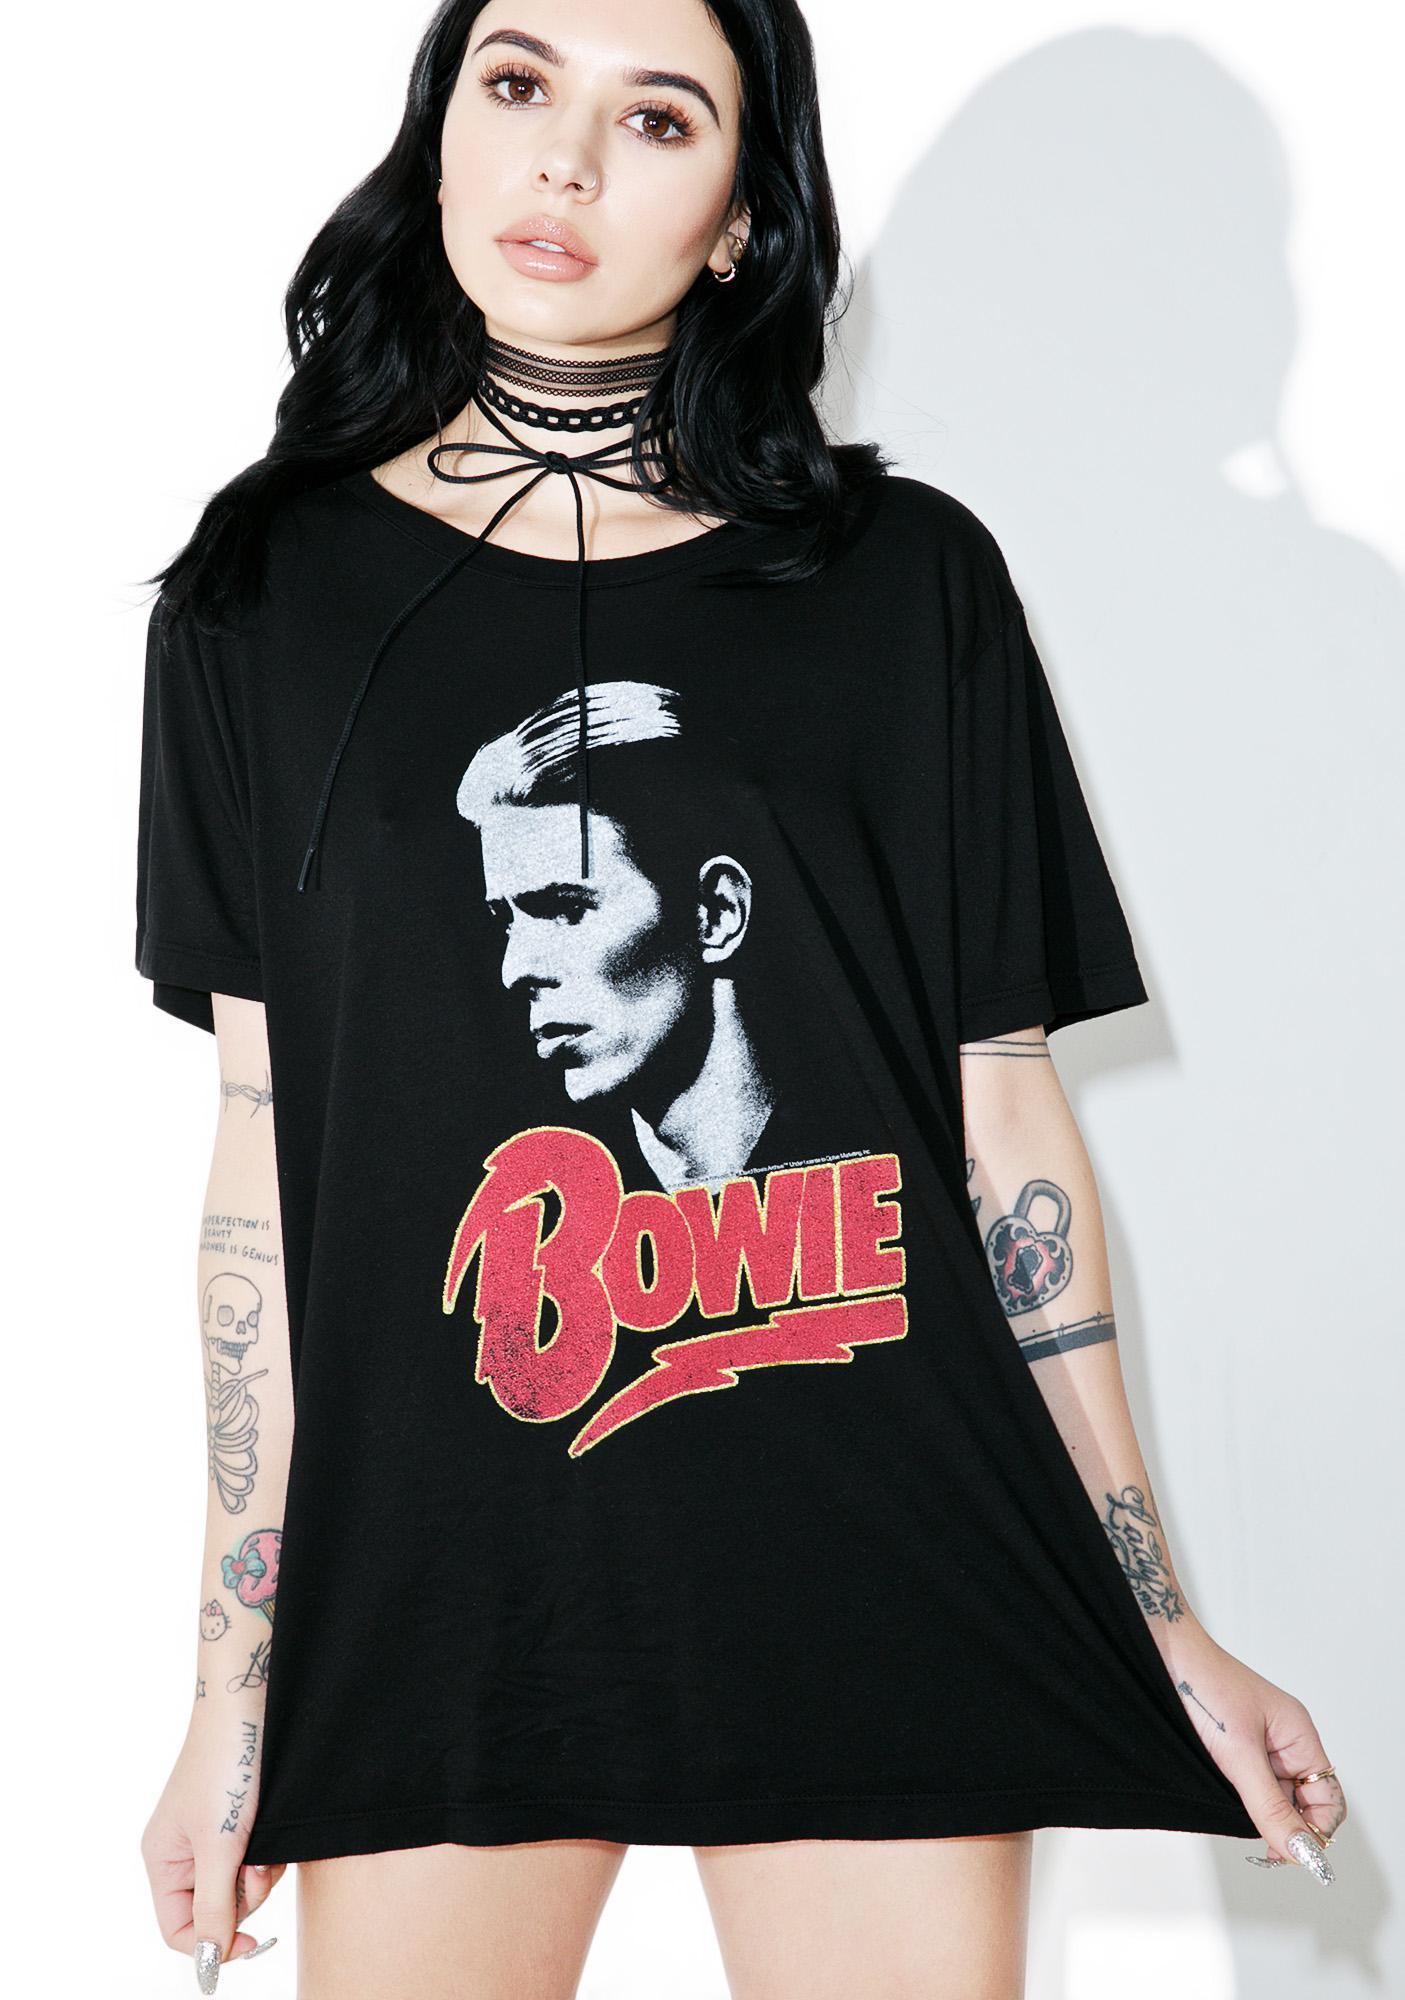 Daydreamer Bowie Portrait Tee